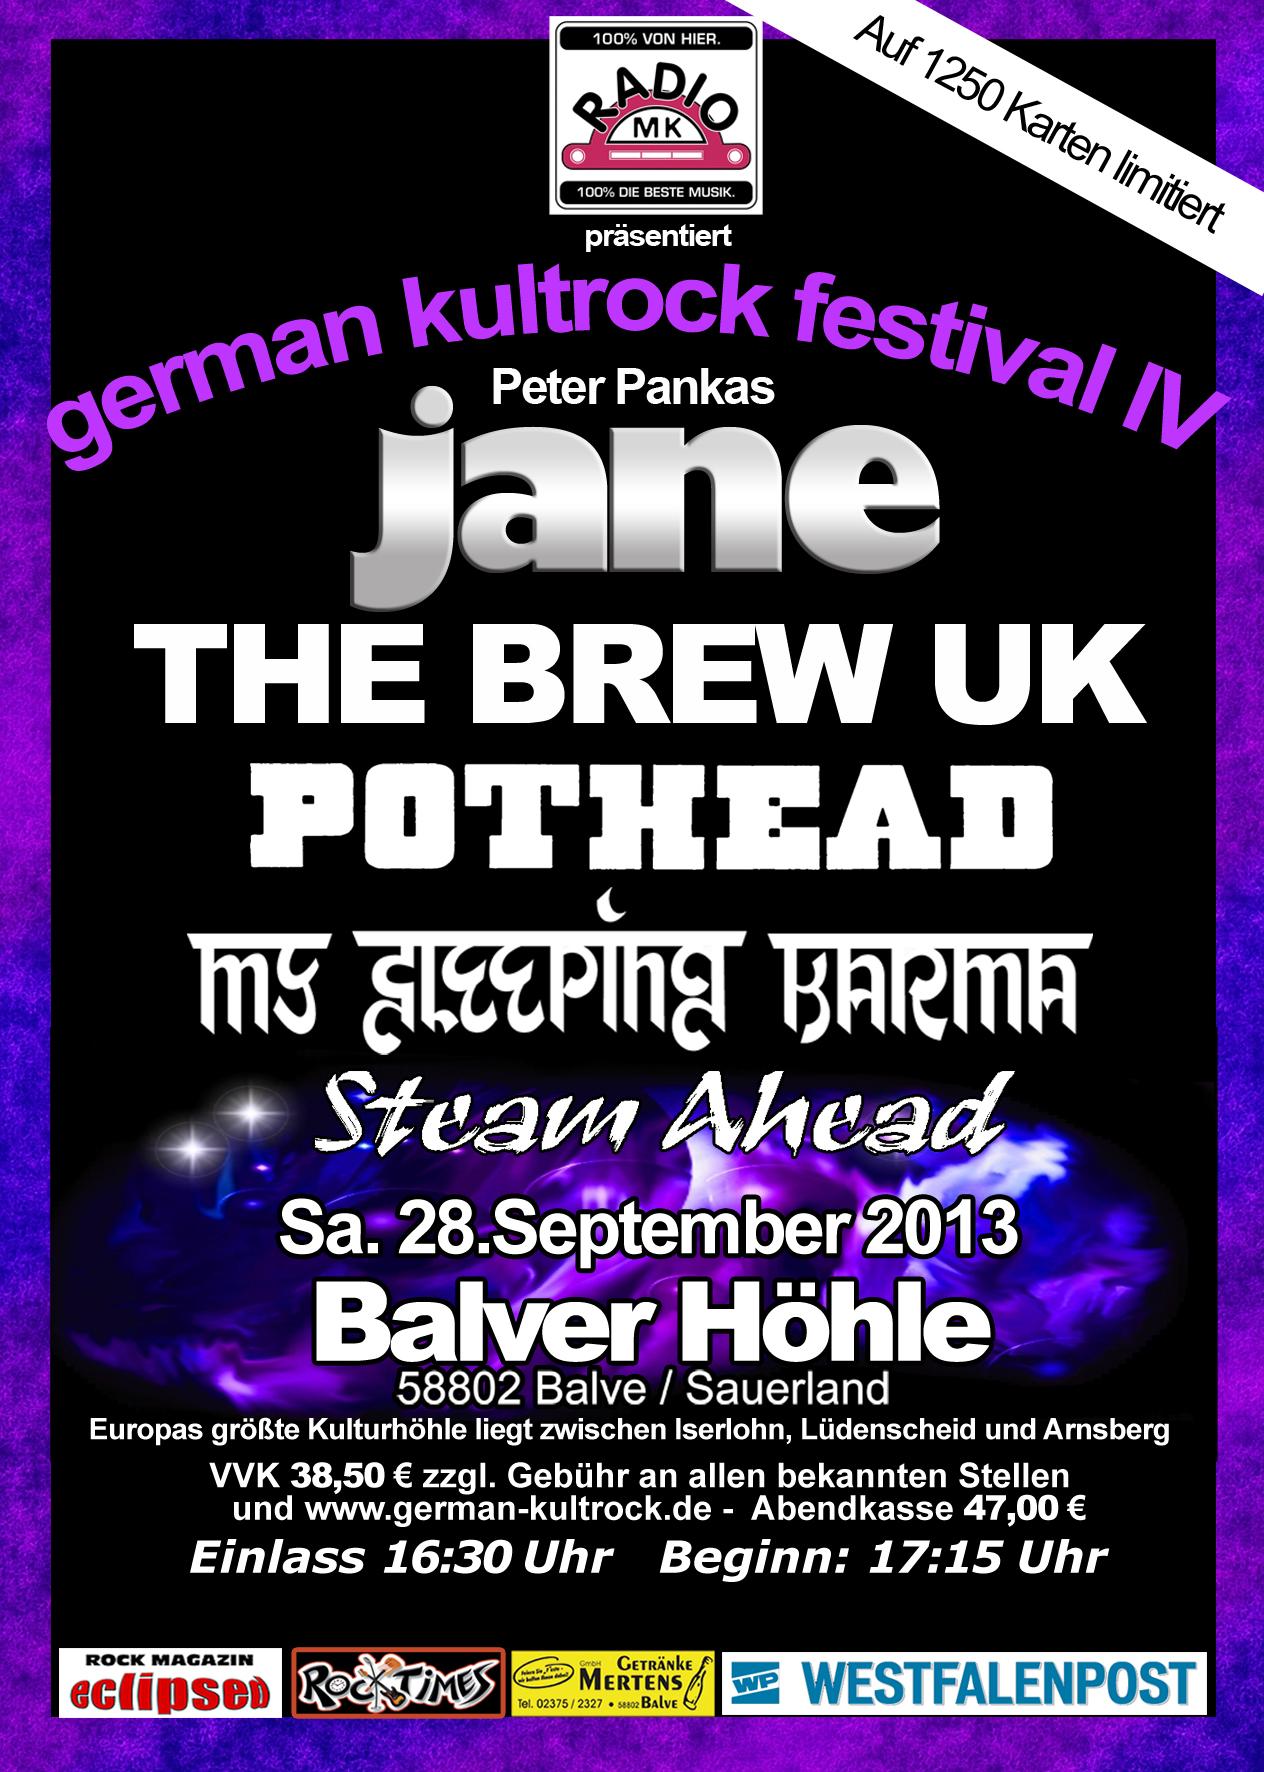 Balver Höhle – German Kultrock Festival